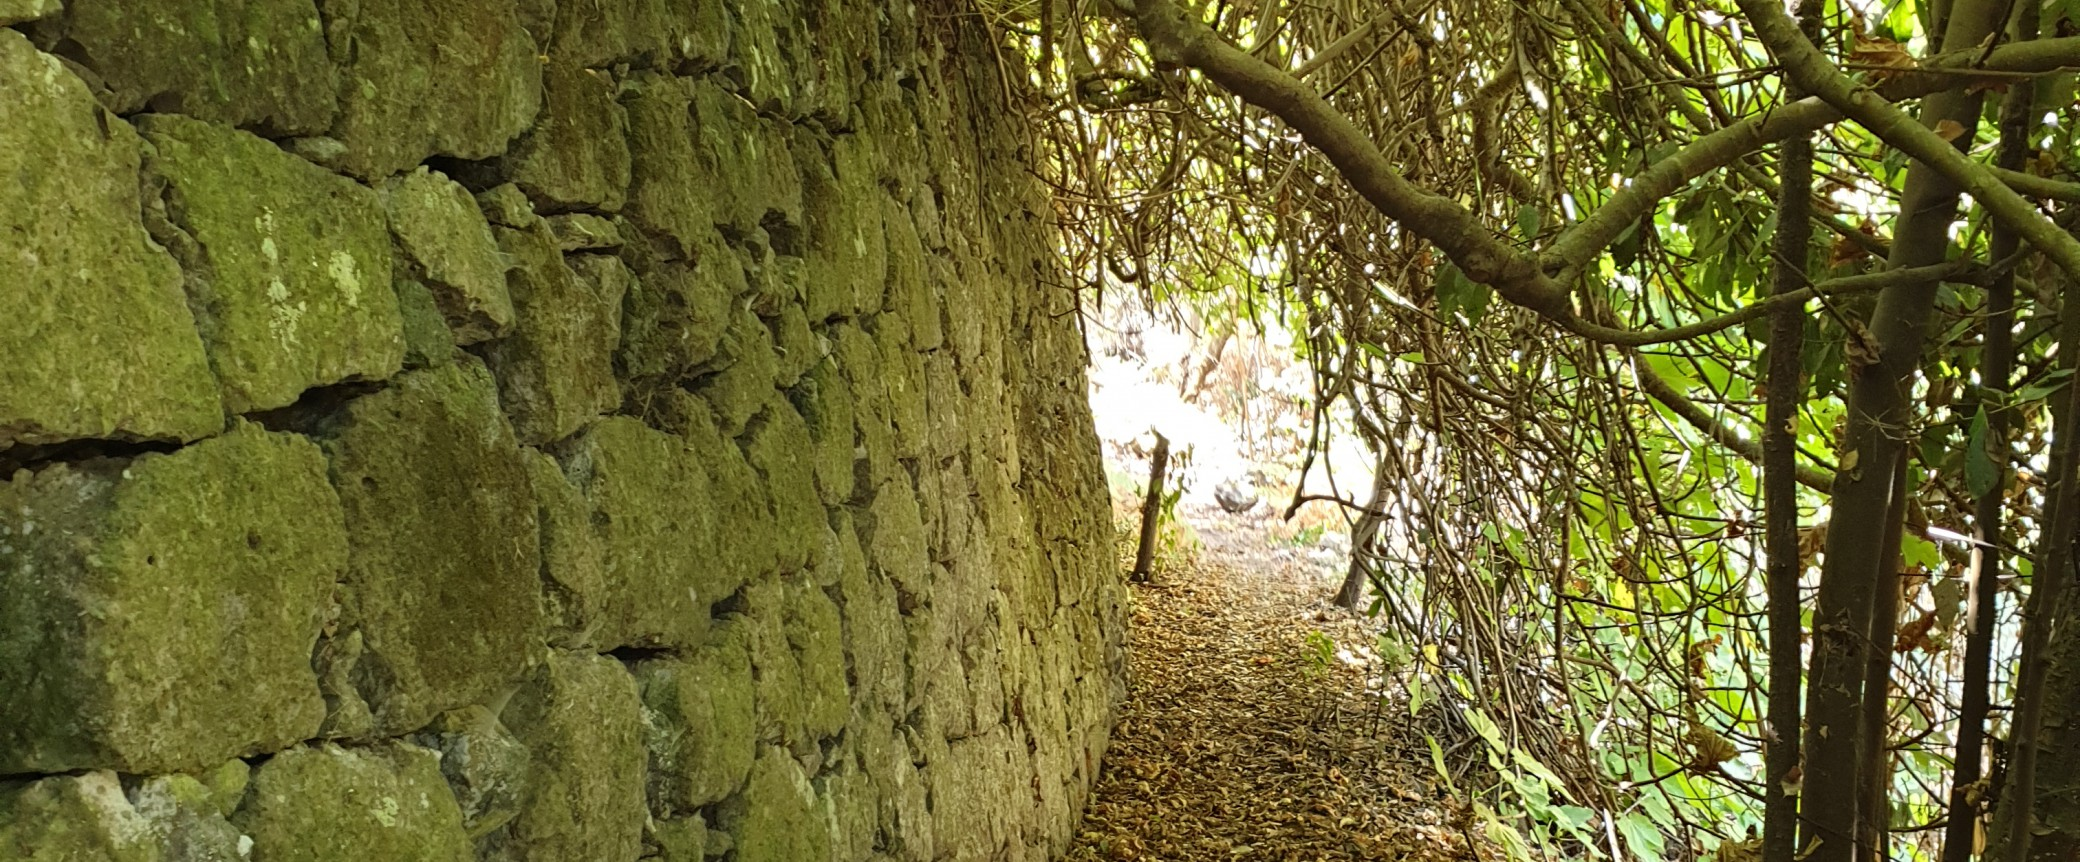 Wandern auf gran canaria Lorbeerwald